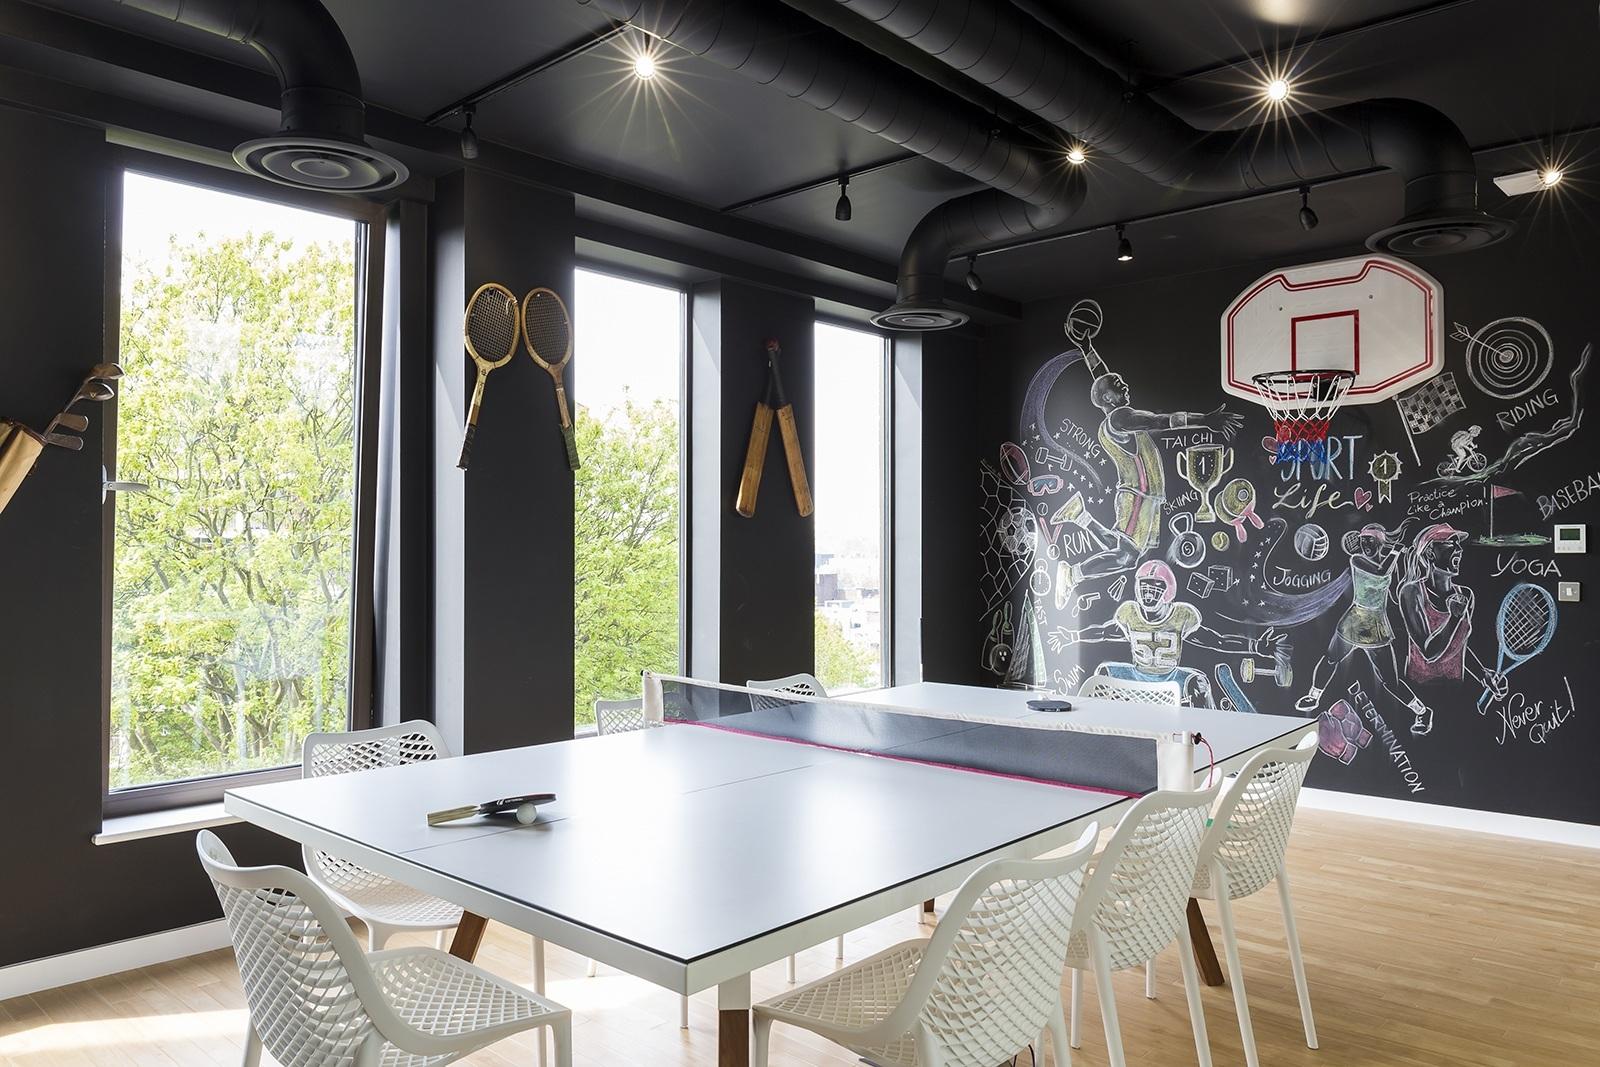 A Tour of Houzz's New European Headquarters - Officelovin'